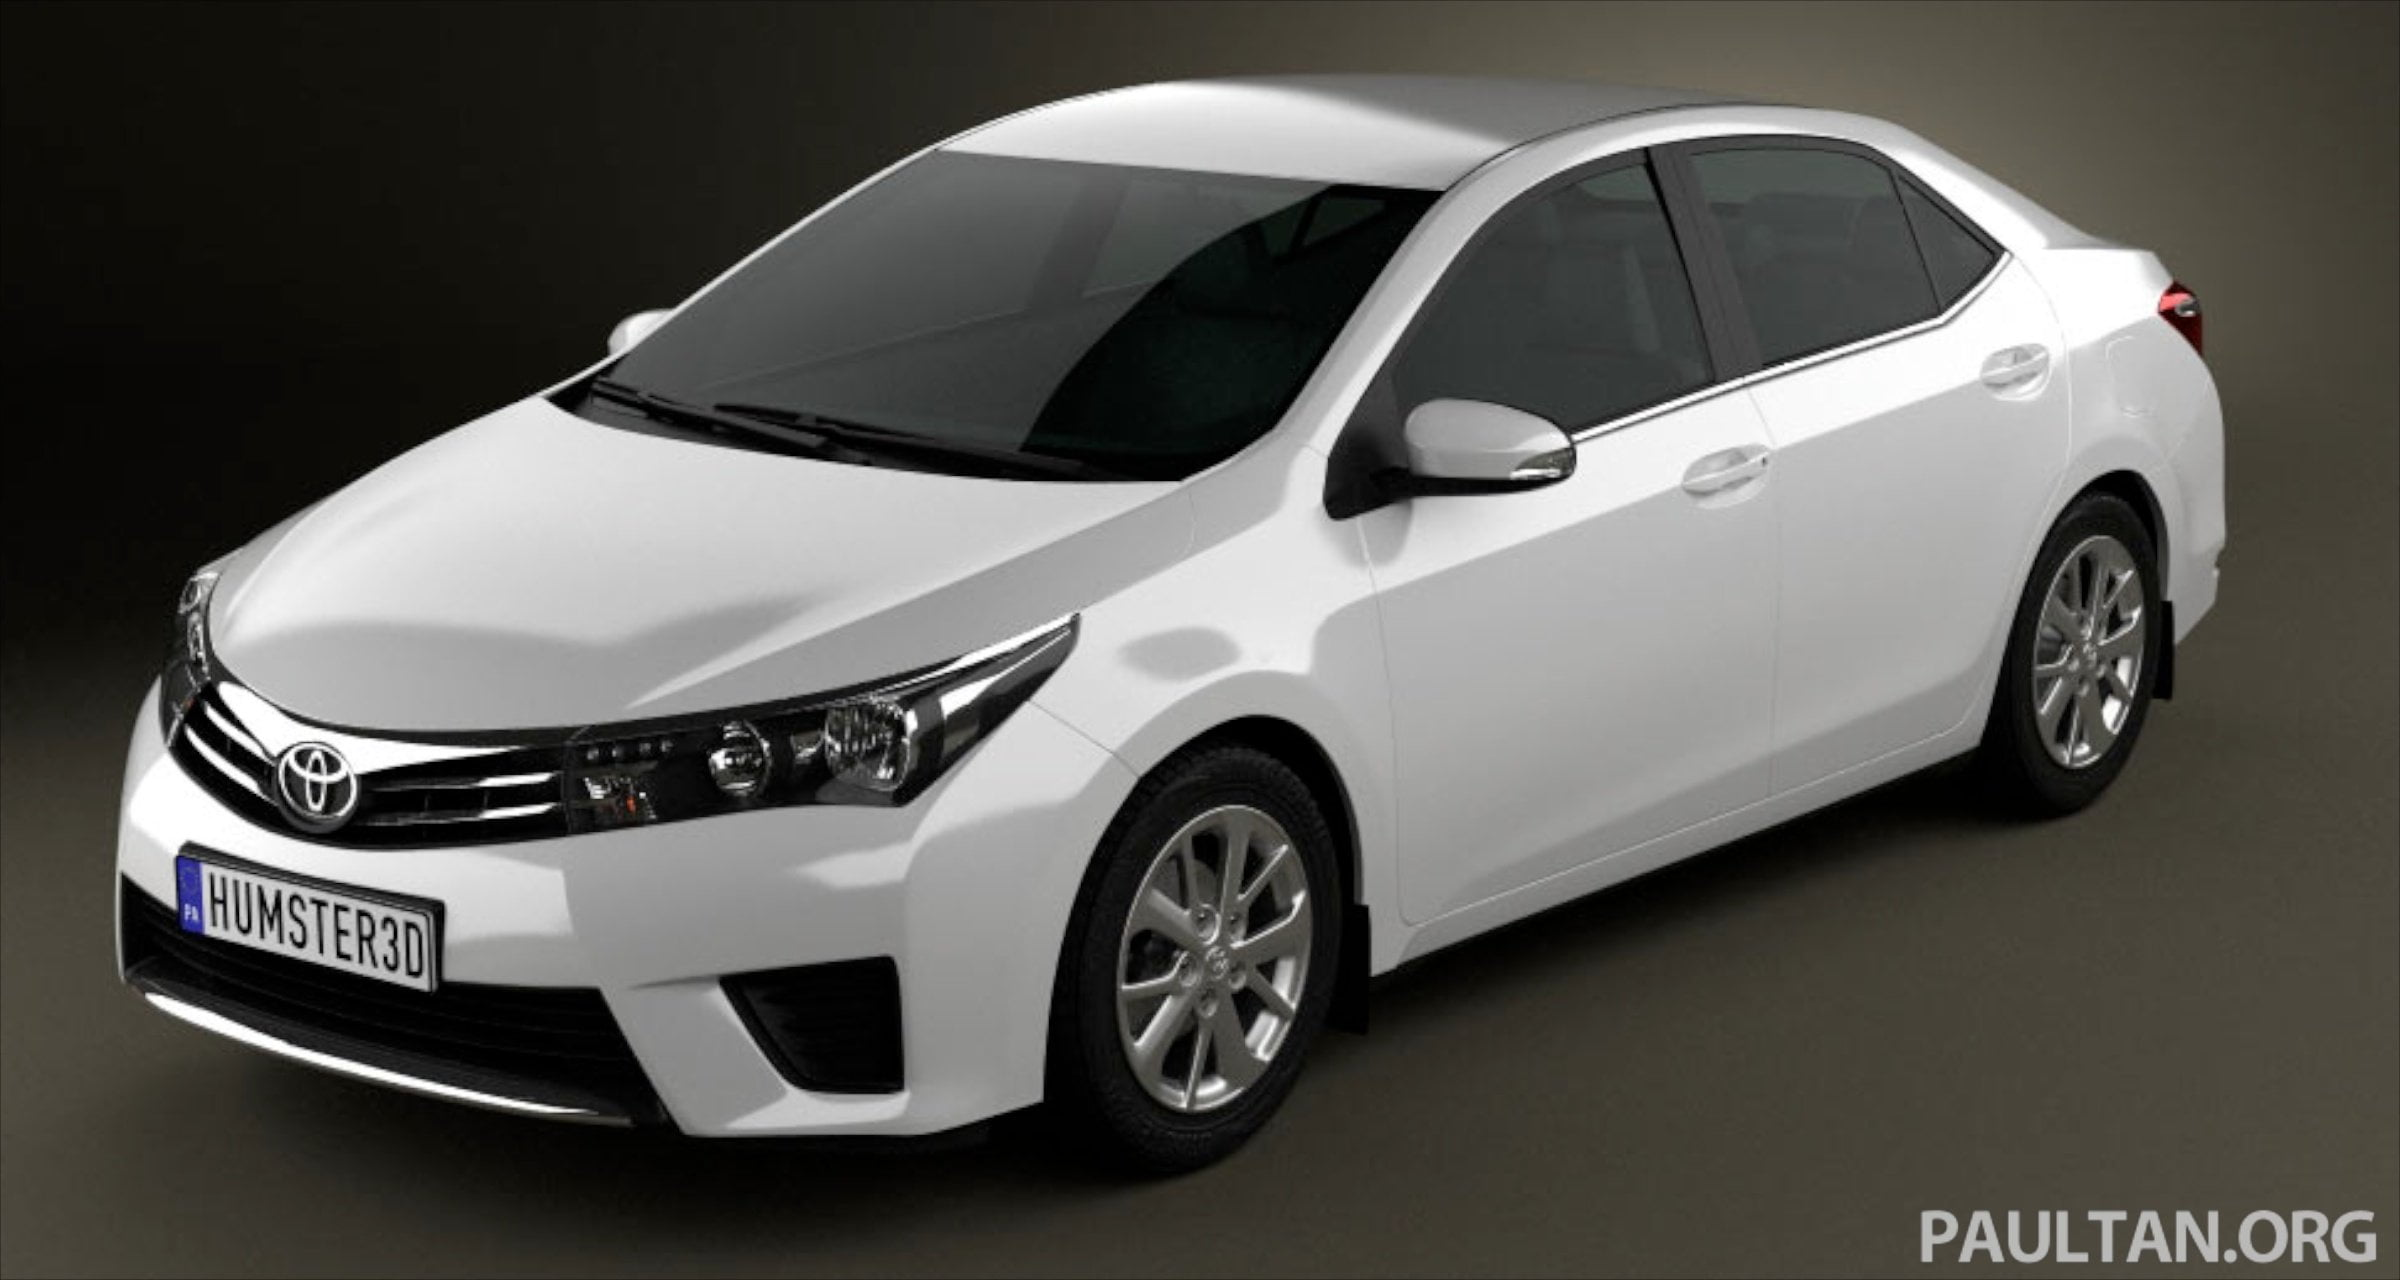 Kelebihan Kekurangan Toyota Altis 2013 Tangguh